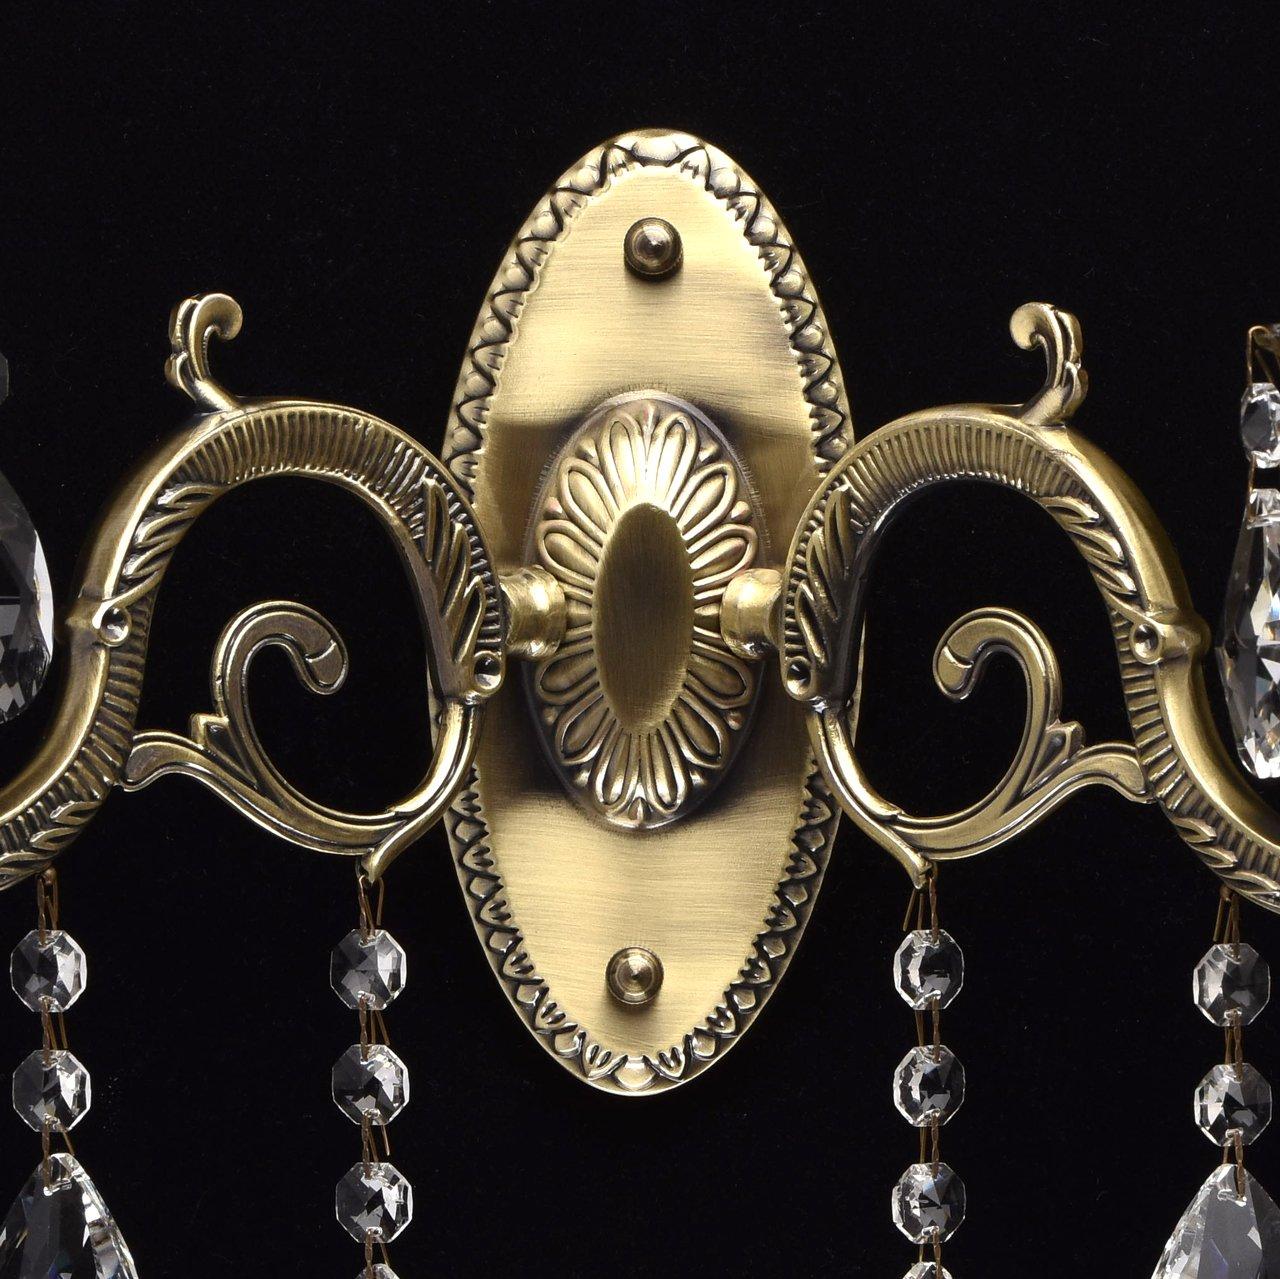 Klassische Kerzen Wandleuchte 1 flammig klares Kristall silberfarbiges Metall